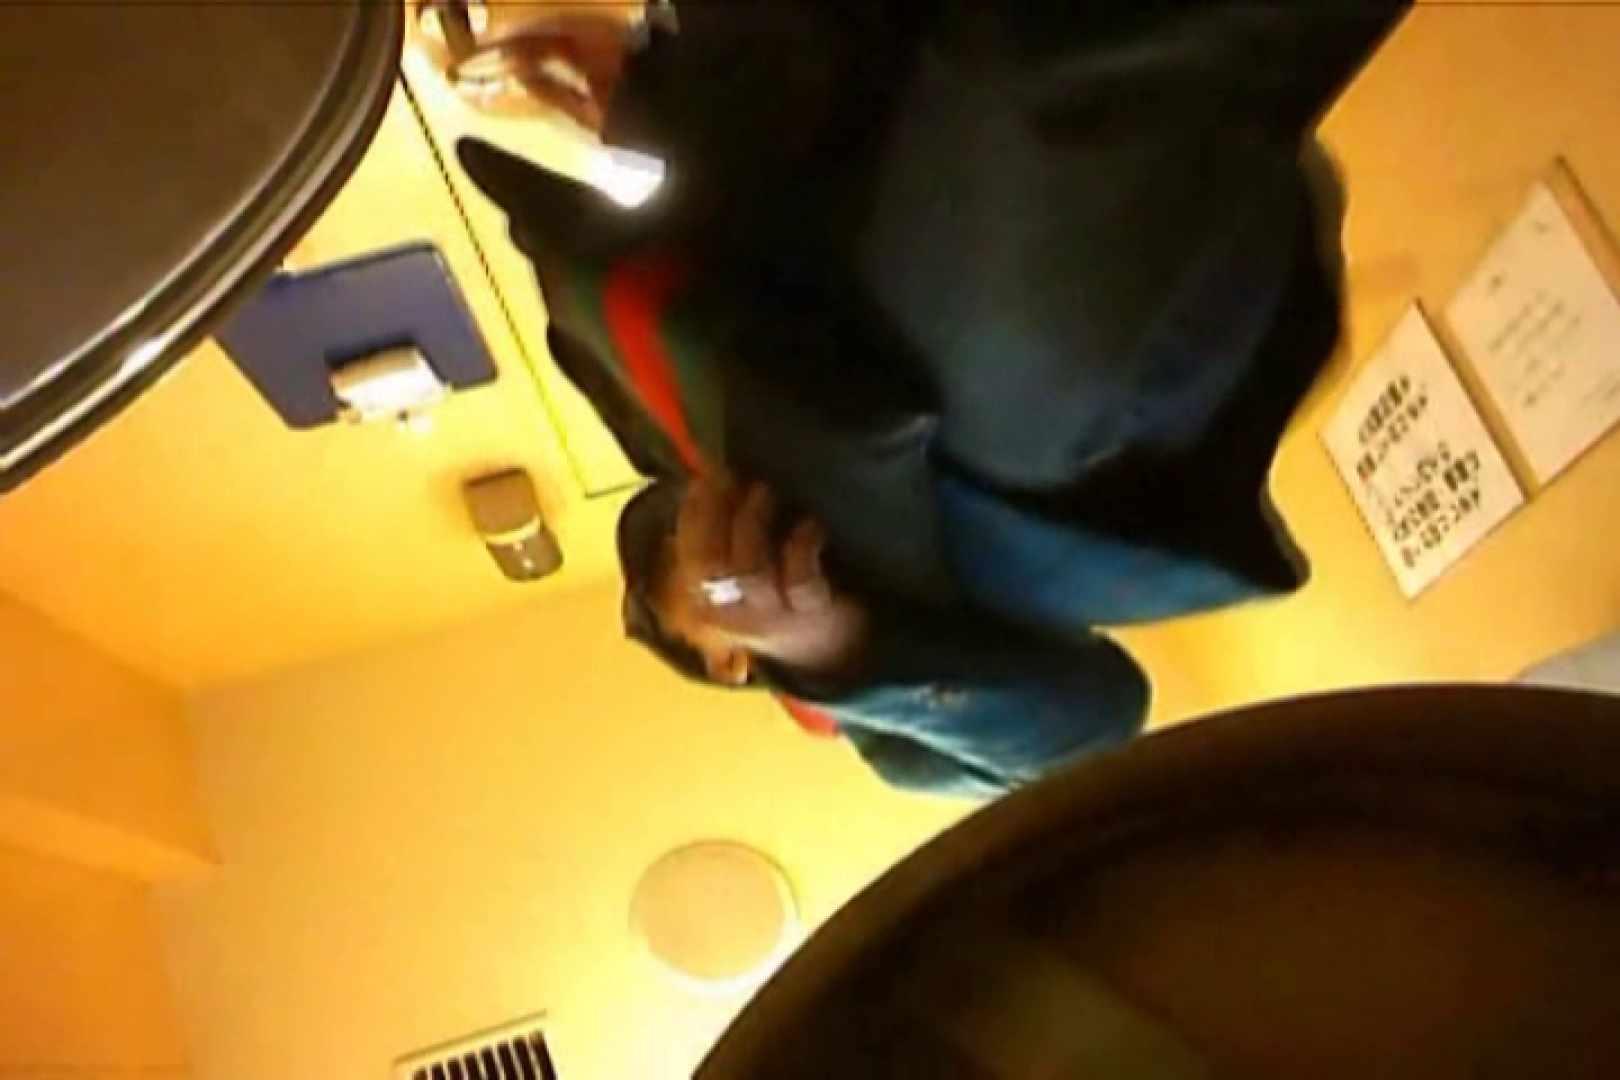 SEASON 2ND!掴み取りさんの洗面所覗き!in新幹線!VOL.13 リーマン系ボーイズ | 人気シリーズ  80pic 23